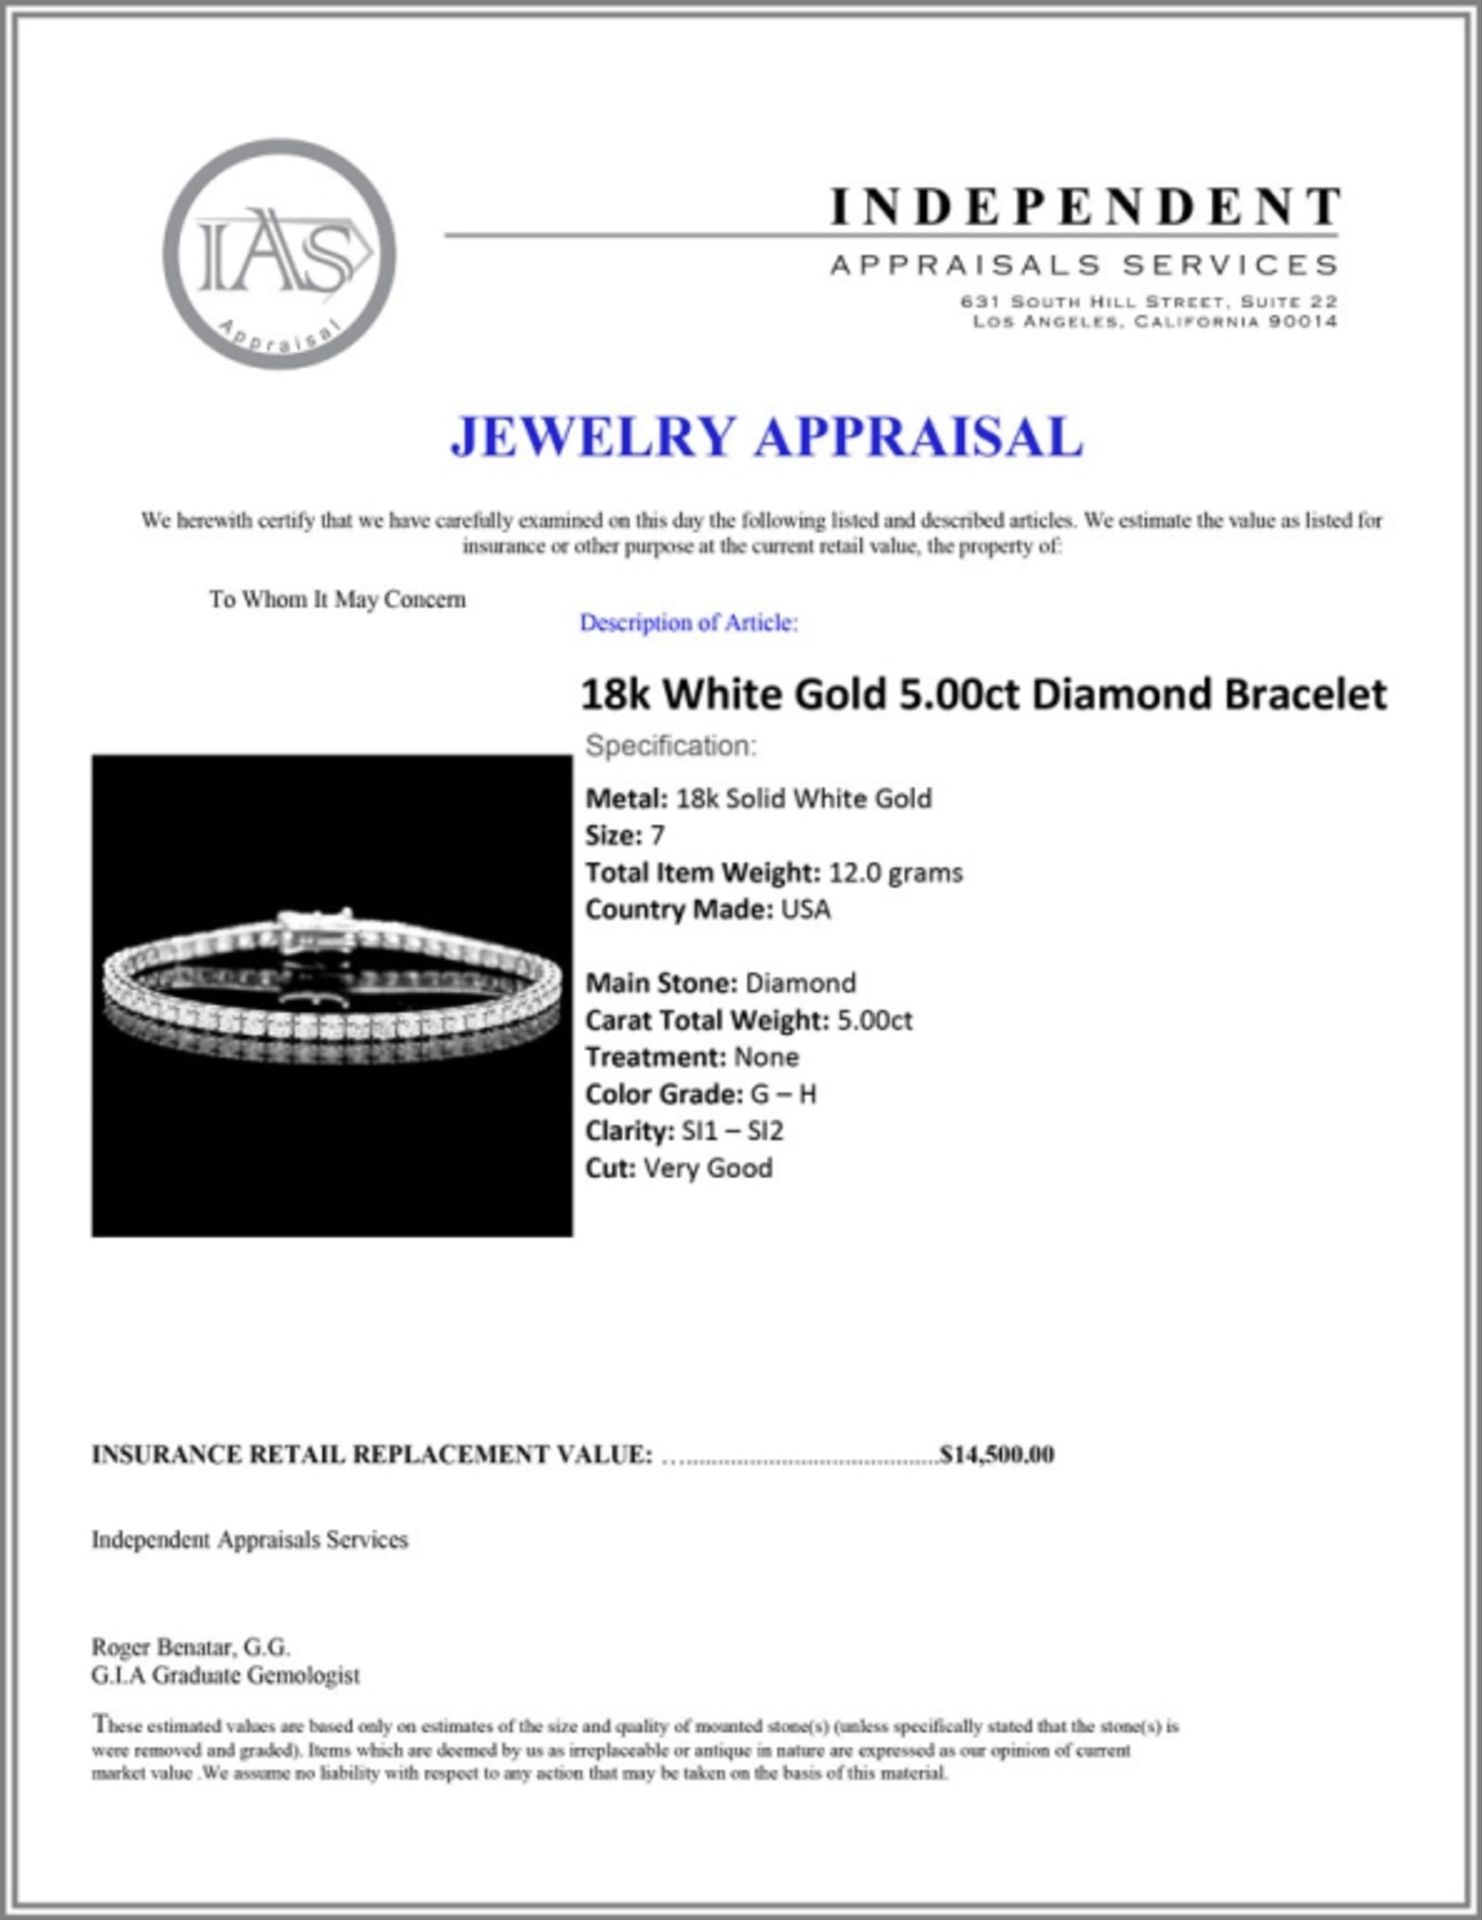 18k White Gold 5.00ct Diamond Bracelet - Image 3 of 3